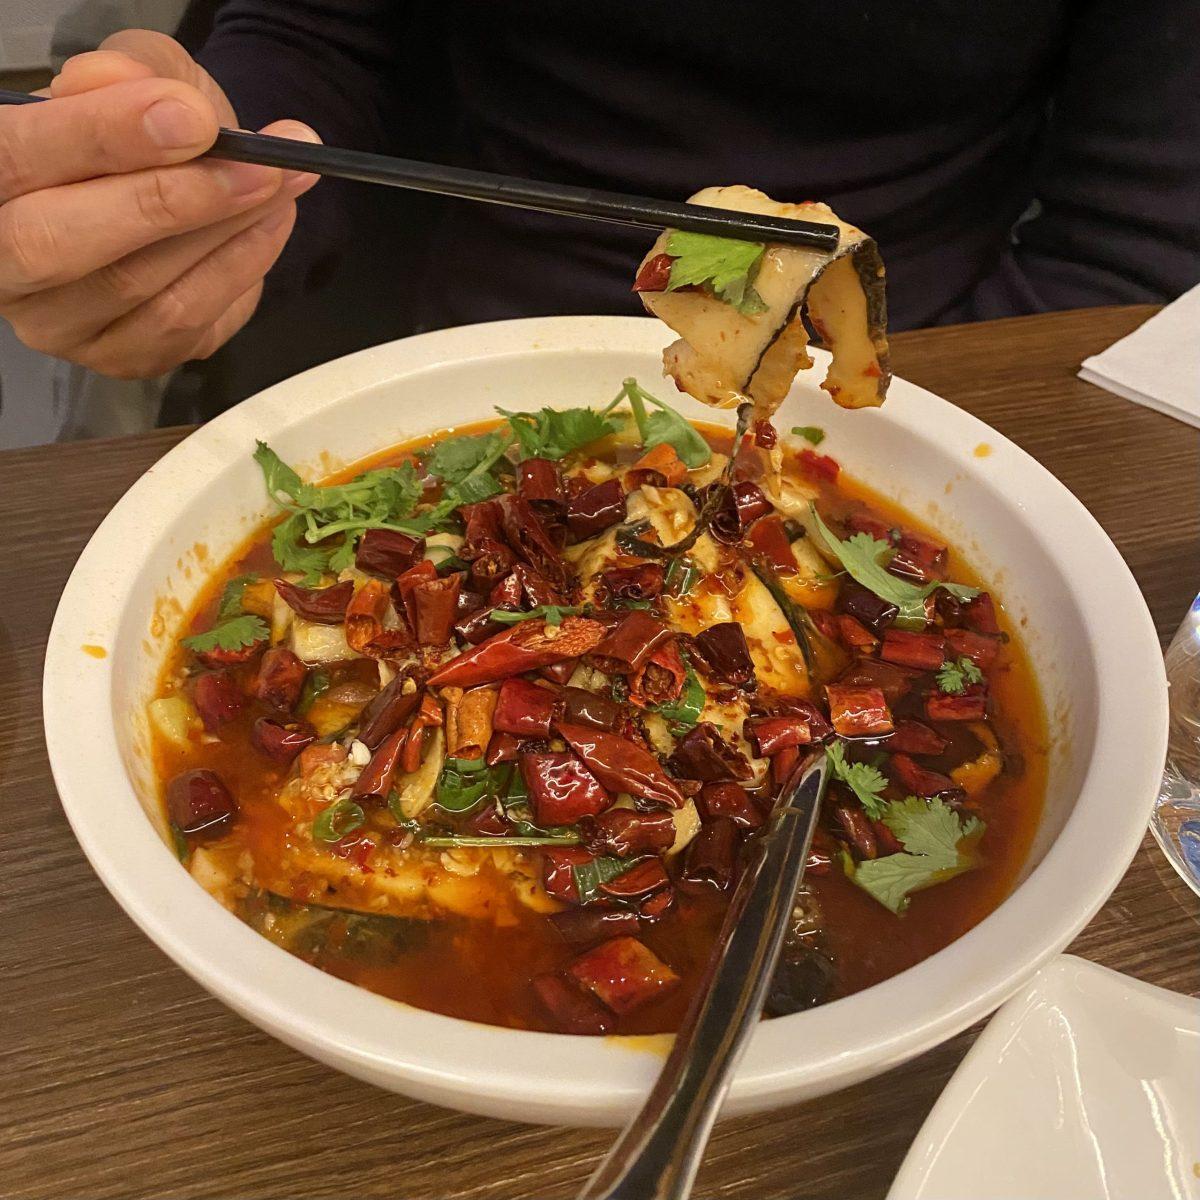 Tofu Vegan Restaurant Chinese Islington London Trendy New Age Vegetarian Plant Based Diet Tasty Delicious Sliced Fish Sizzling Chilli Oil